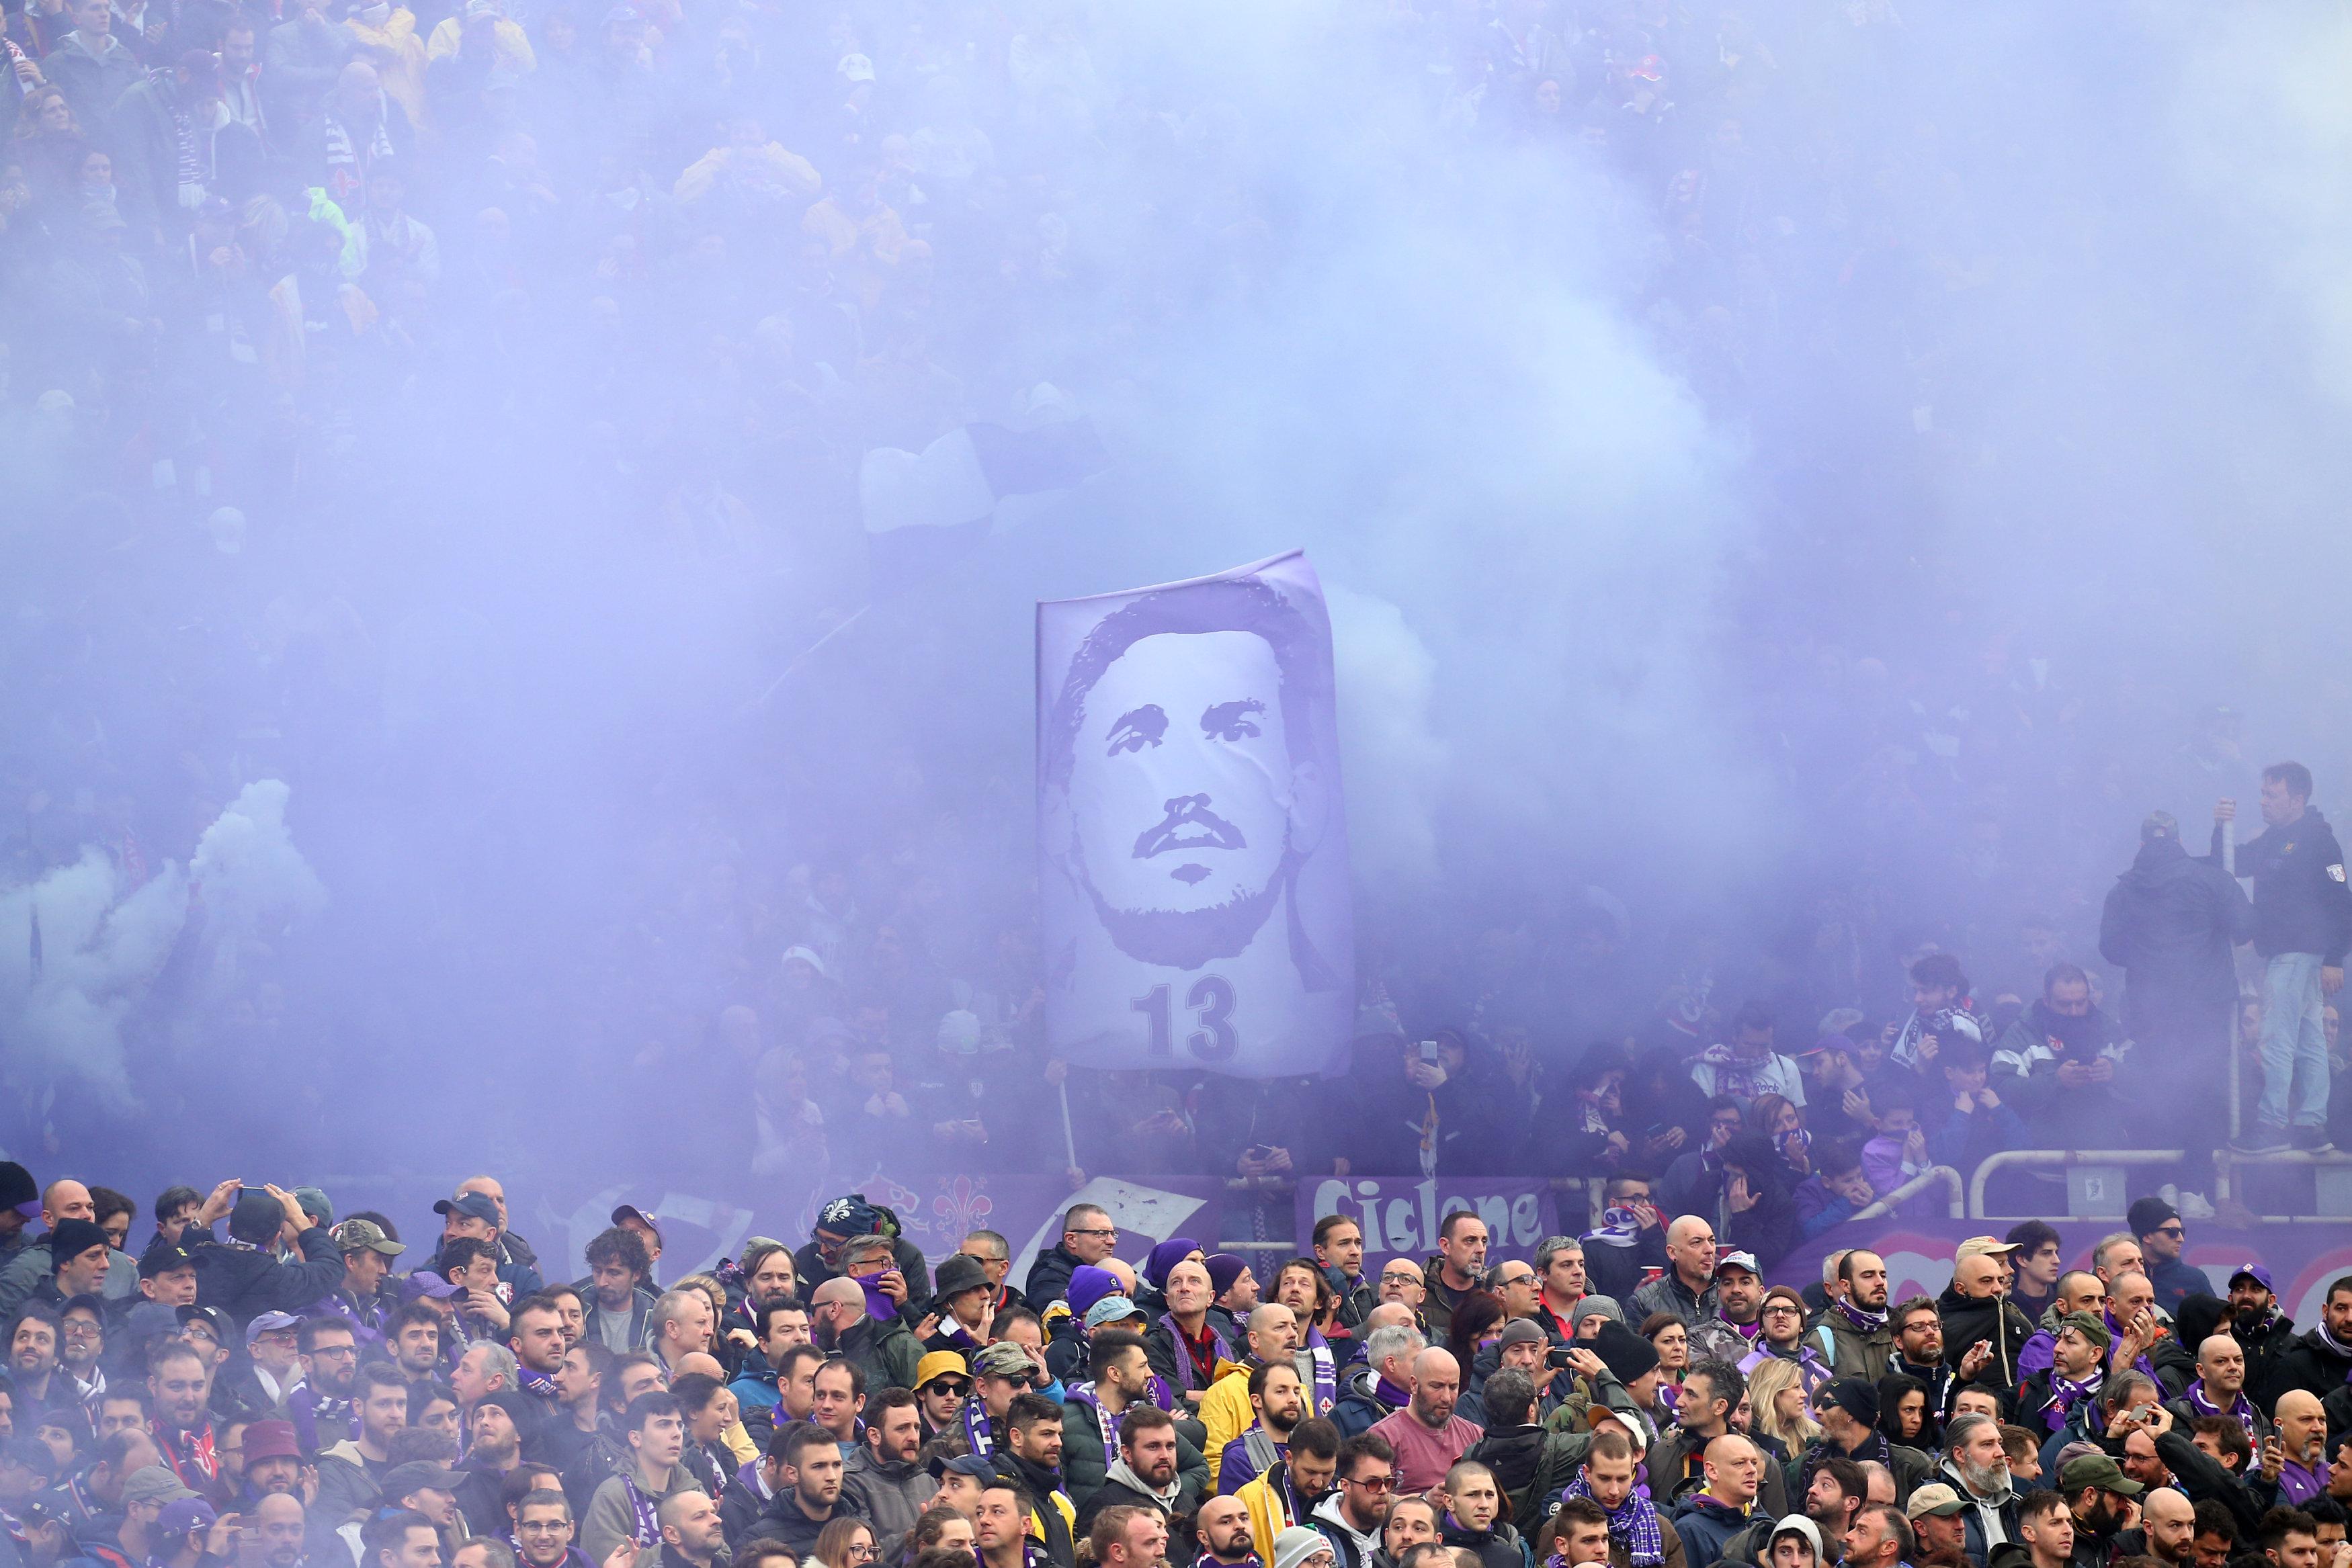 Football: Fiorentina honour Astori with 1-0 win over Benevento